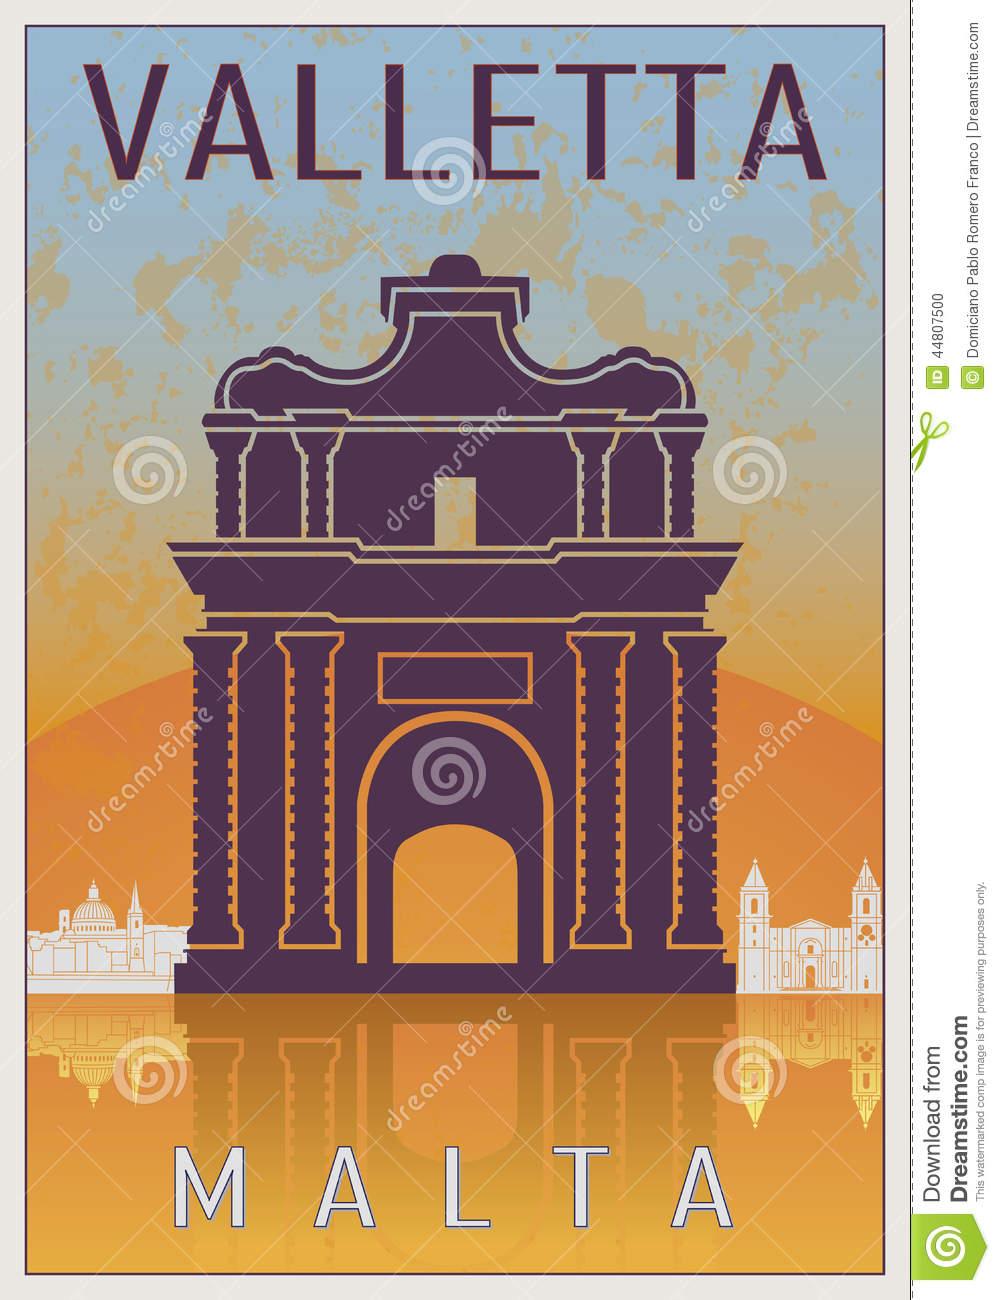 Valletta Vintage Poster Stock Vector.